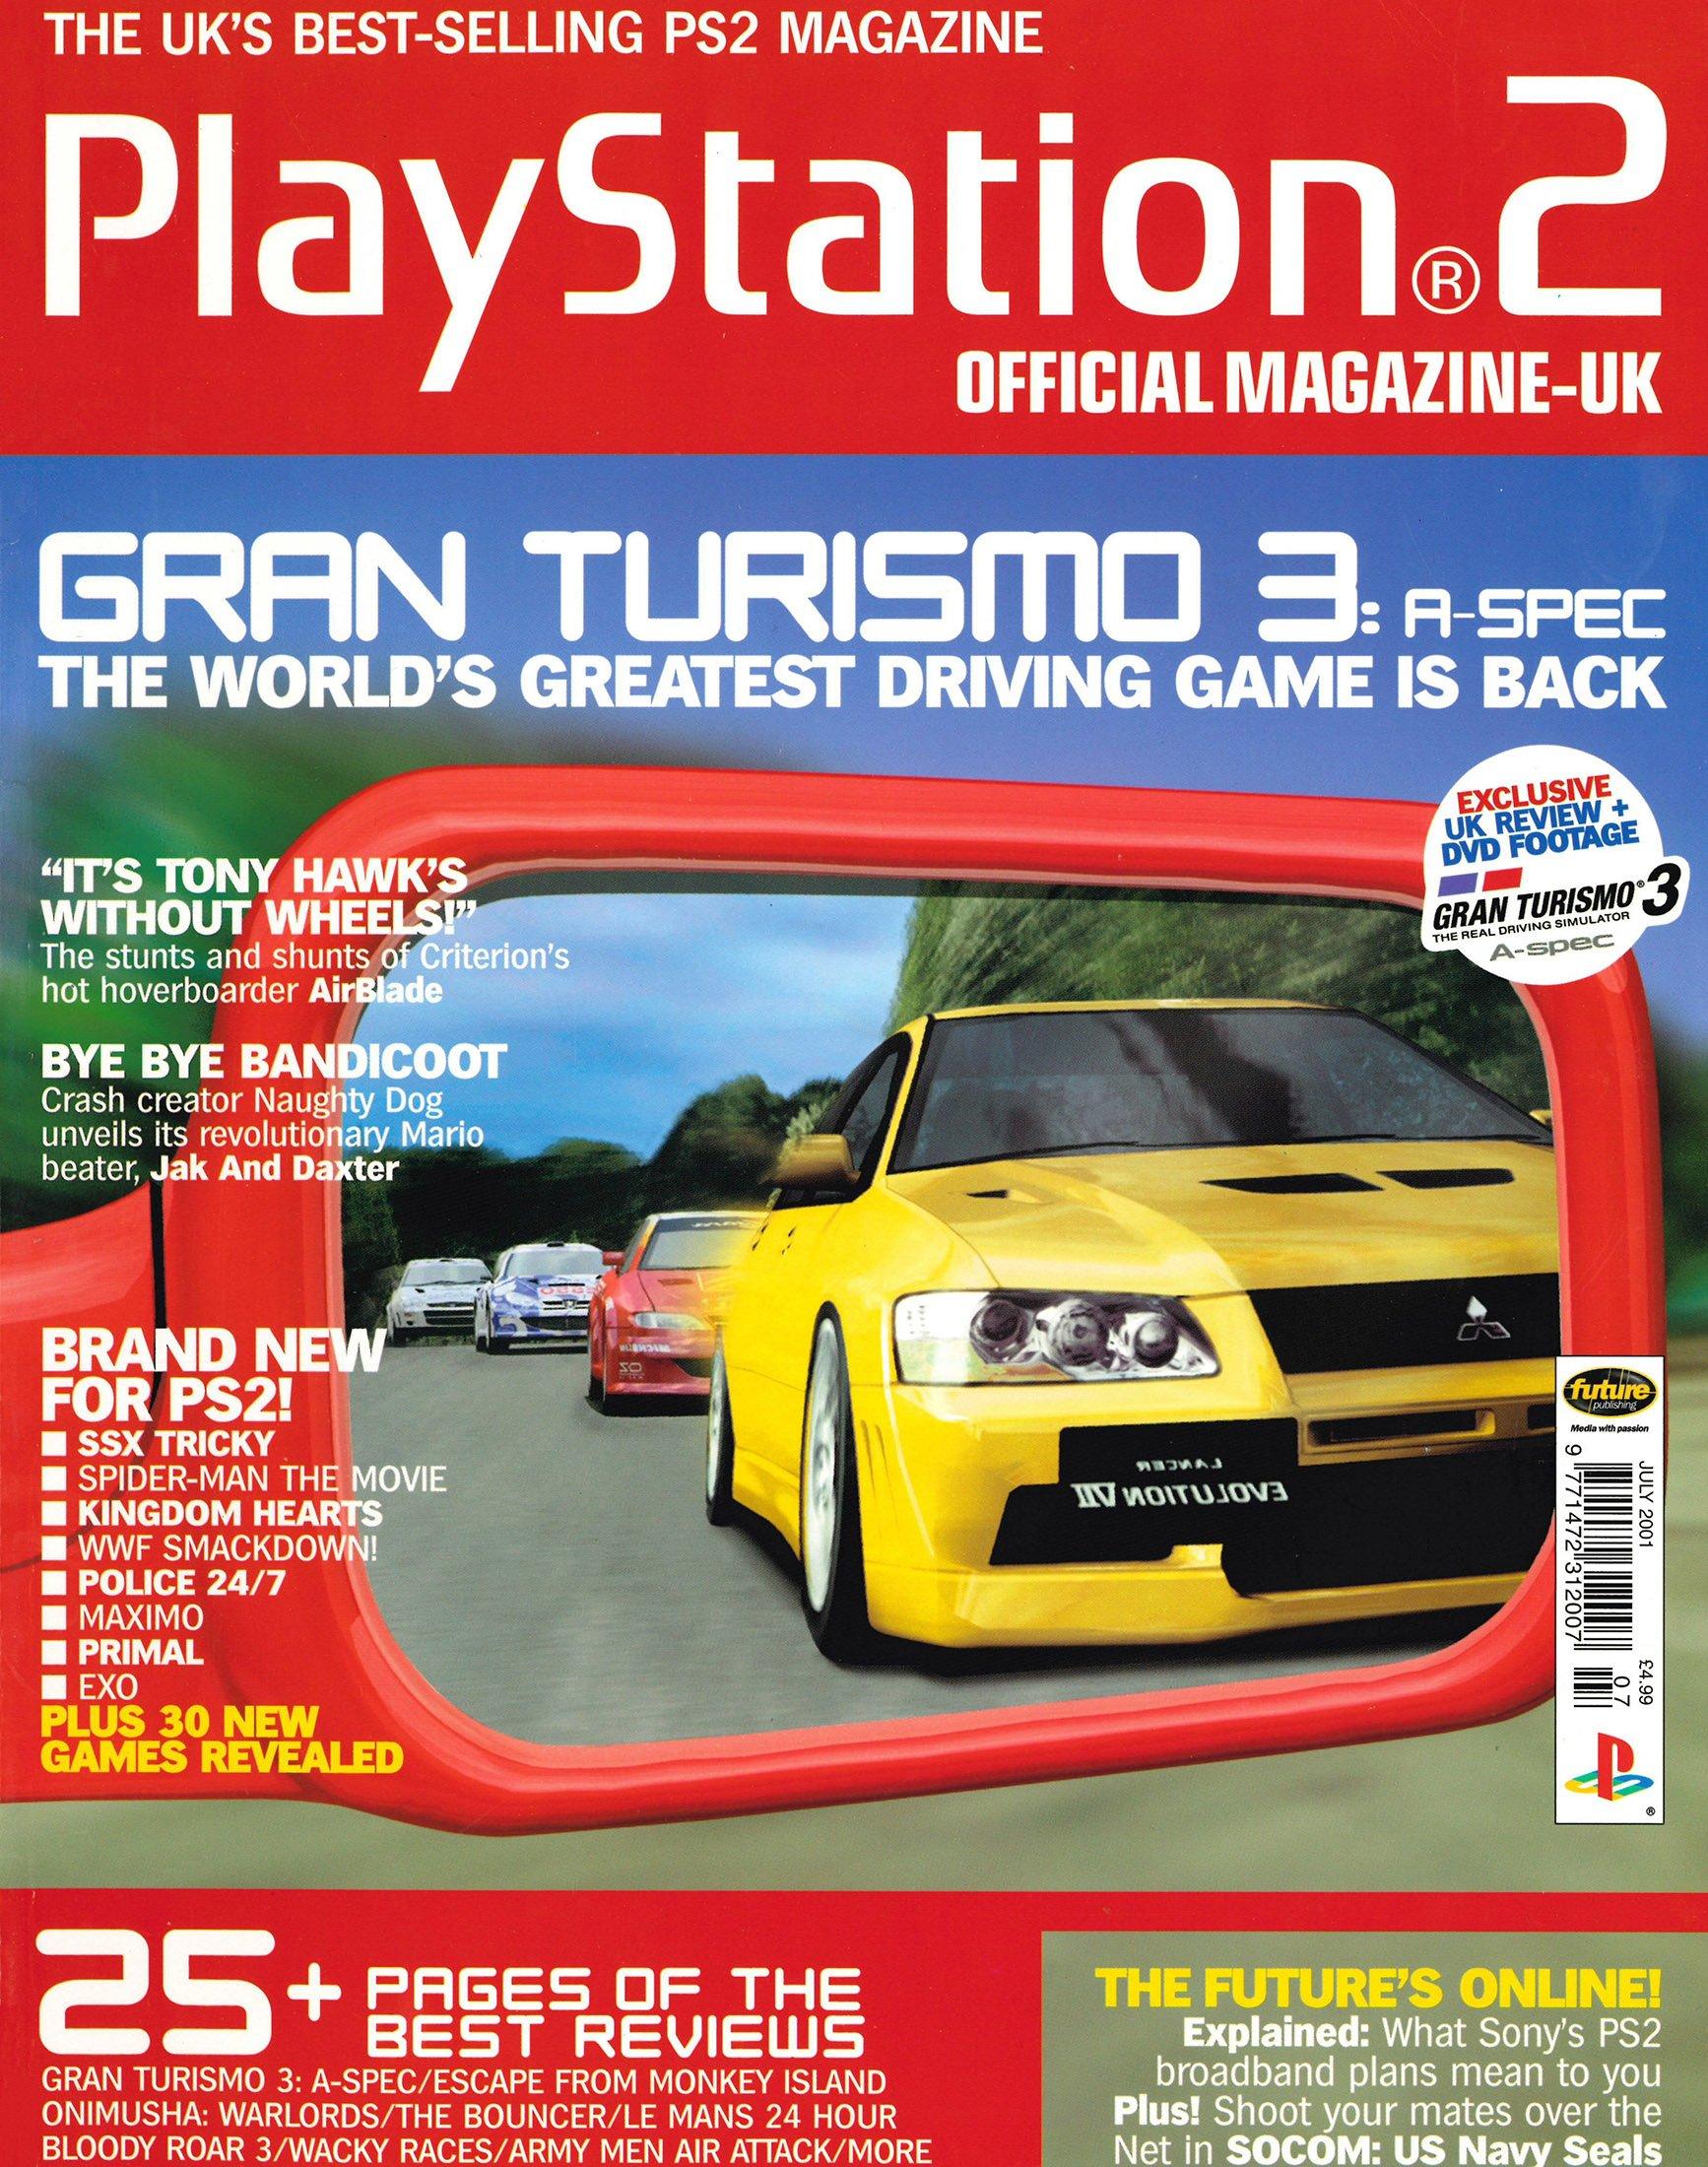 Official Playstation 2 Magazine UK 009 (July 2001)